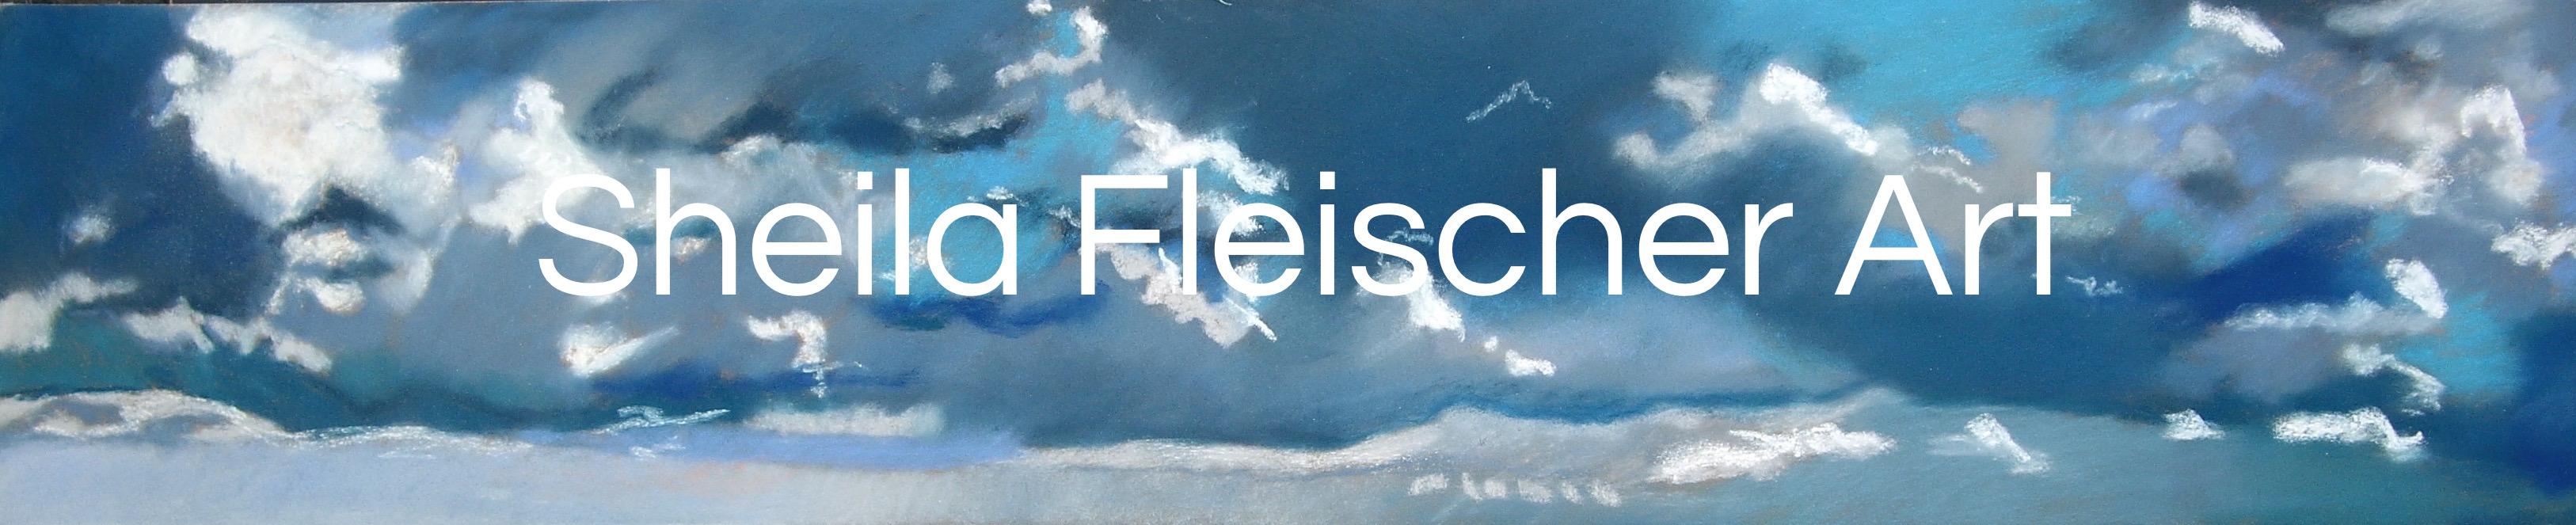 Sheila Fleischer Art